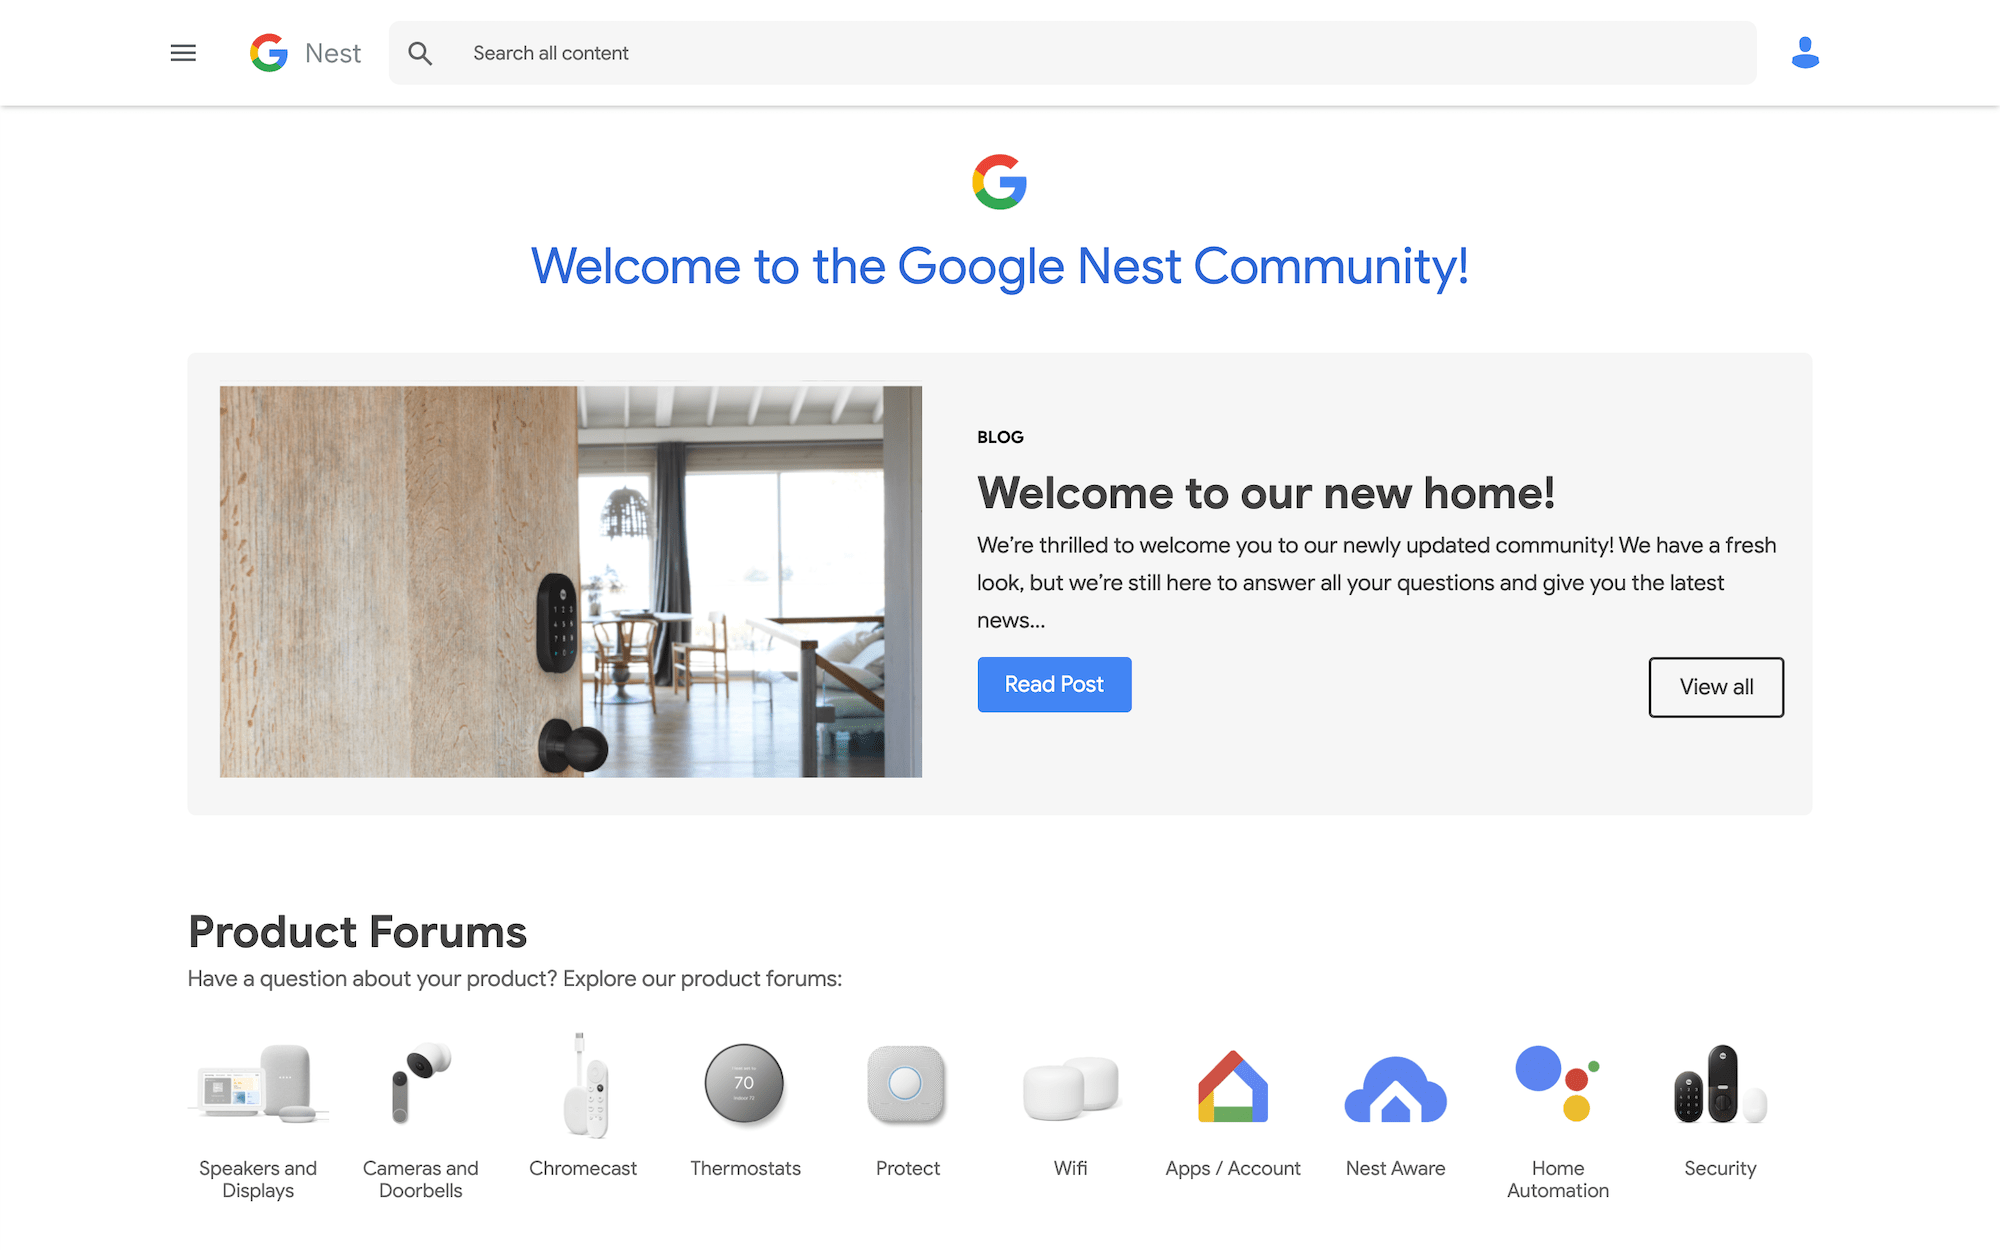 New Google Nest Community